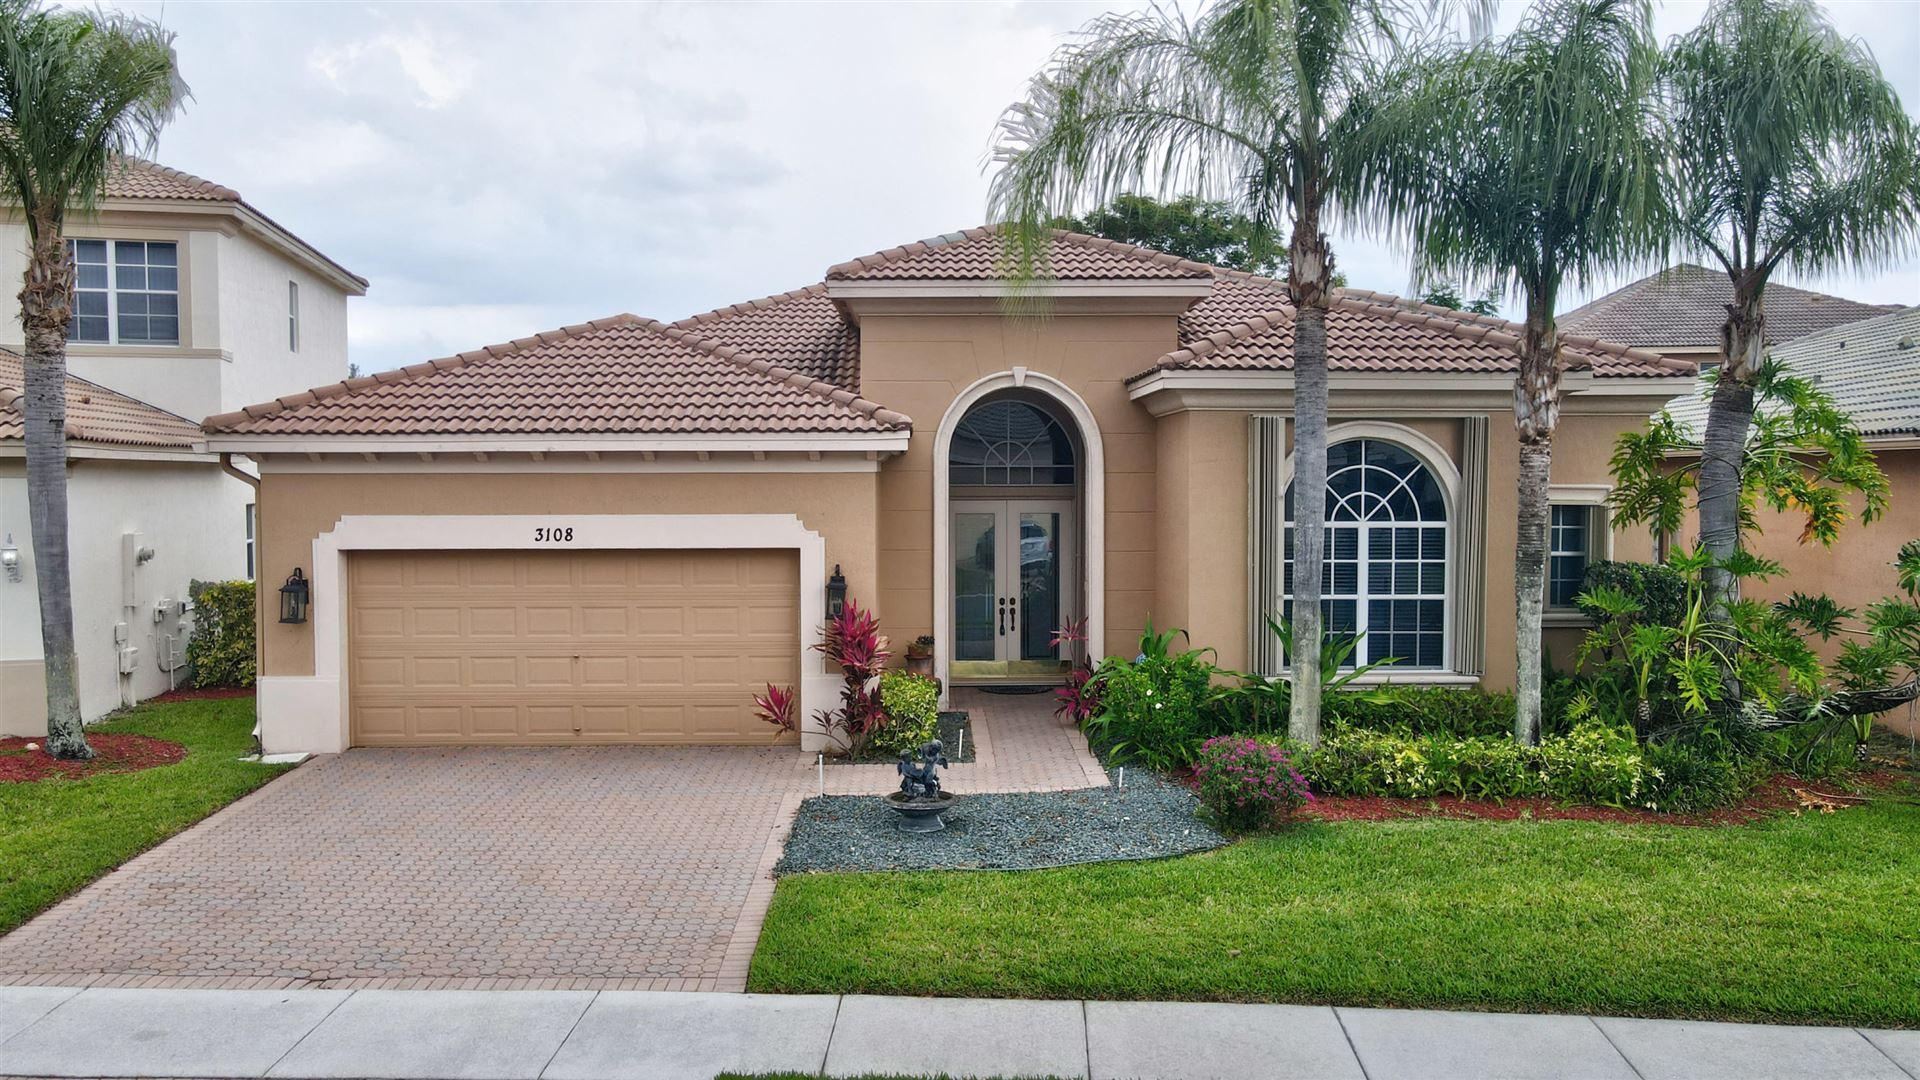 3108 Santa Margarita Road, West Palm Beach, FL 33411 - MLS#: RX-10712973